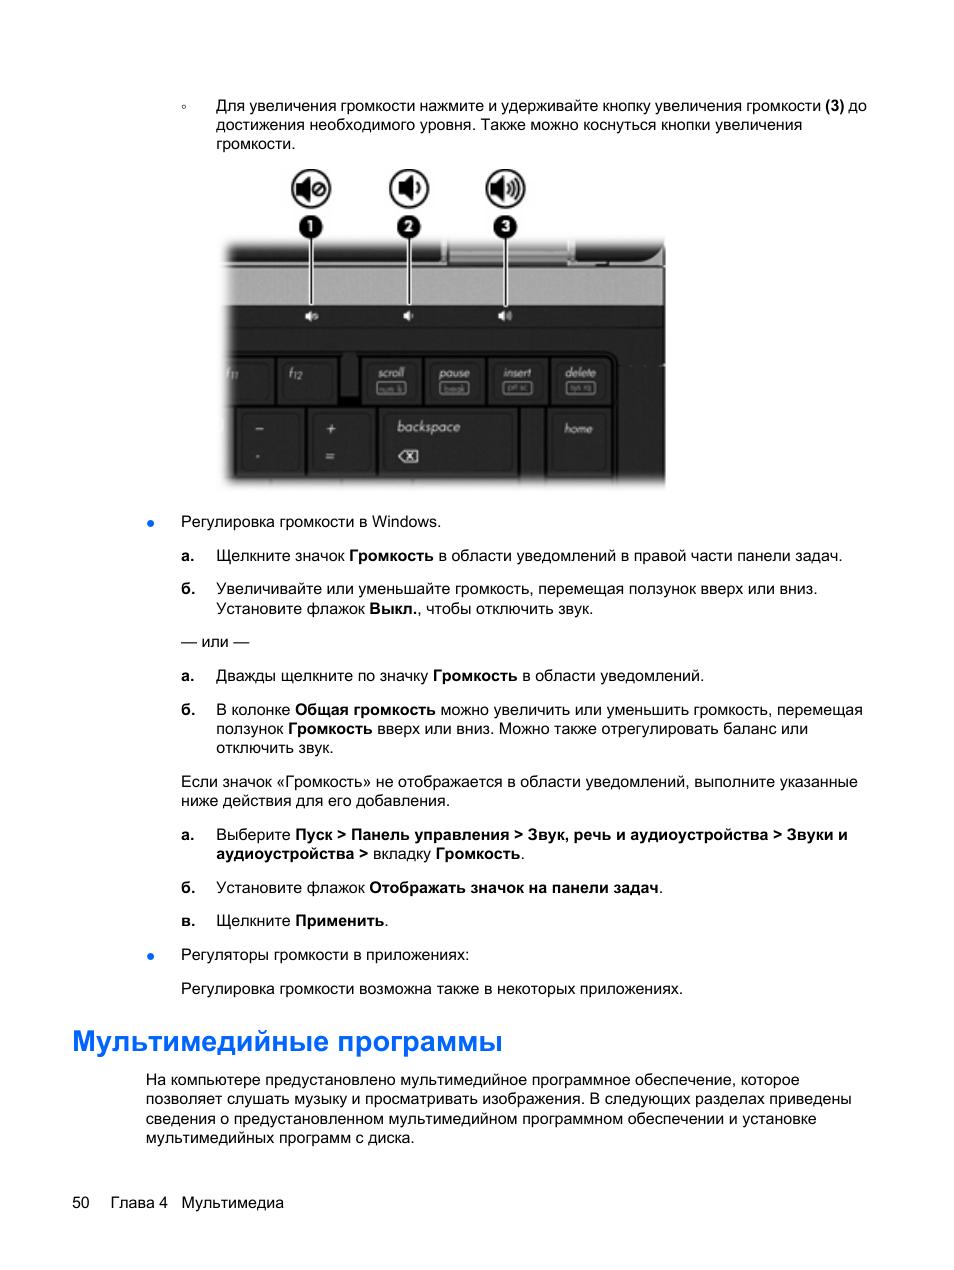 Ноутбуки hp инструкции по эксплуатации